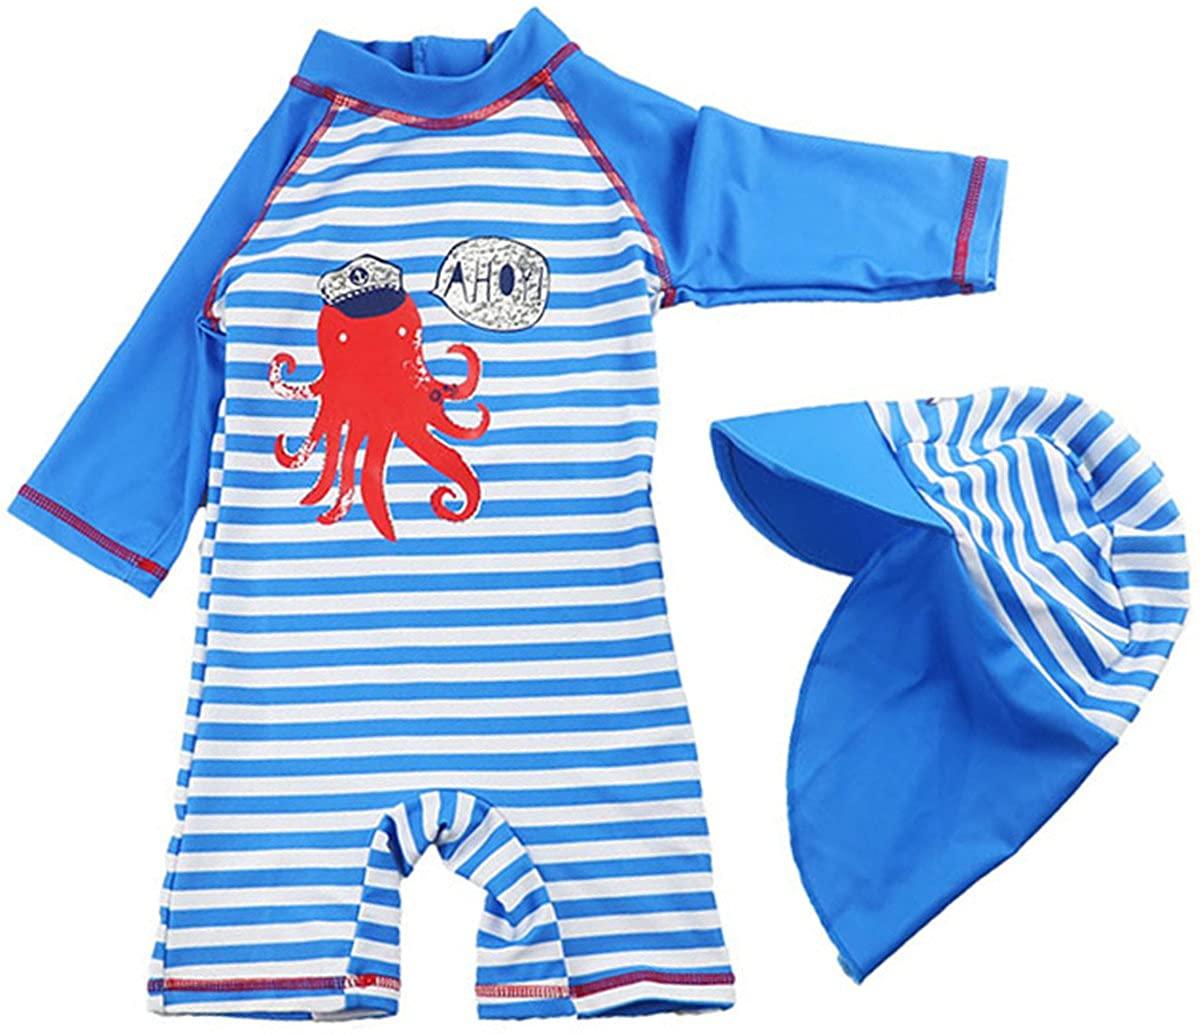 Baby Kids Boys Girls One Pieces Cartoon Print Long Sleeve Rash Guard UPF 50+ UV Swimsuit with Sun Hat